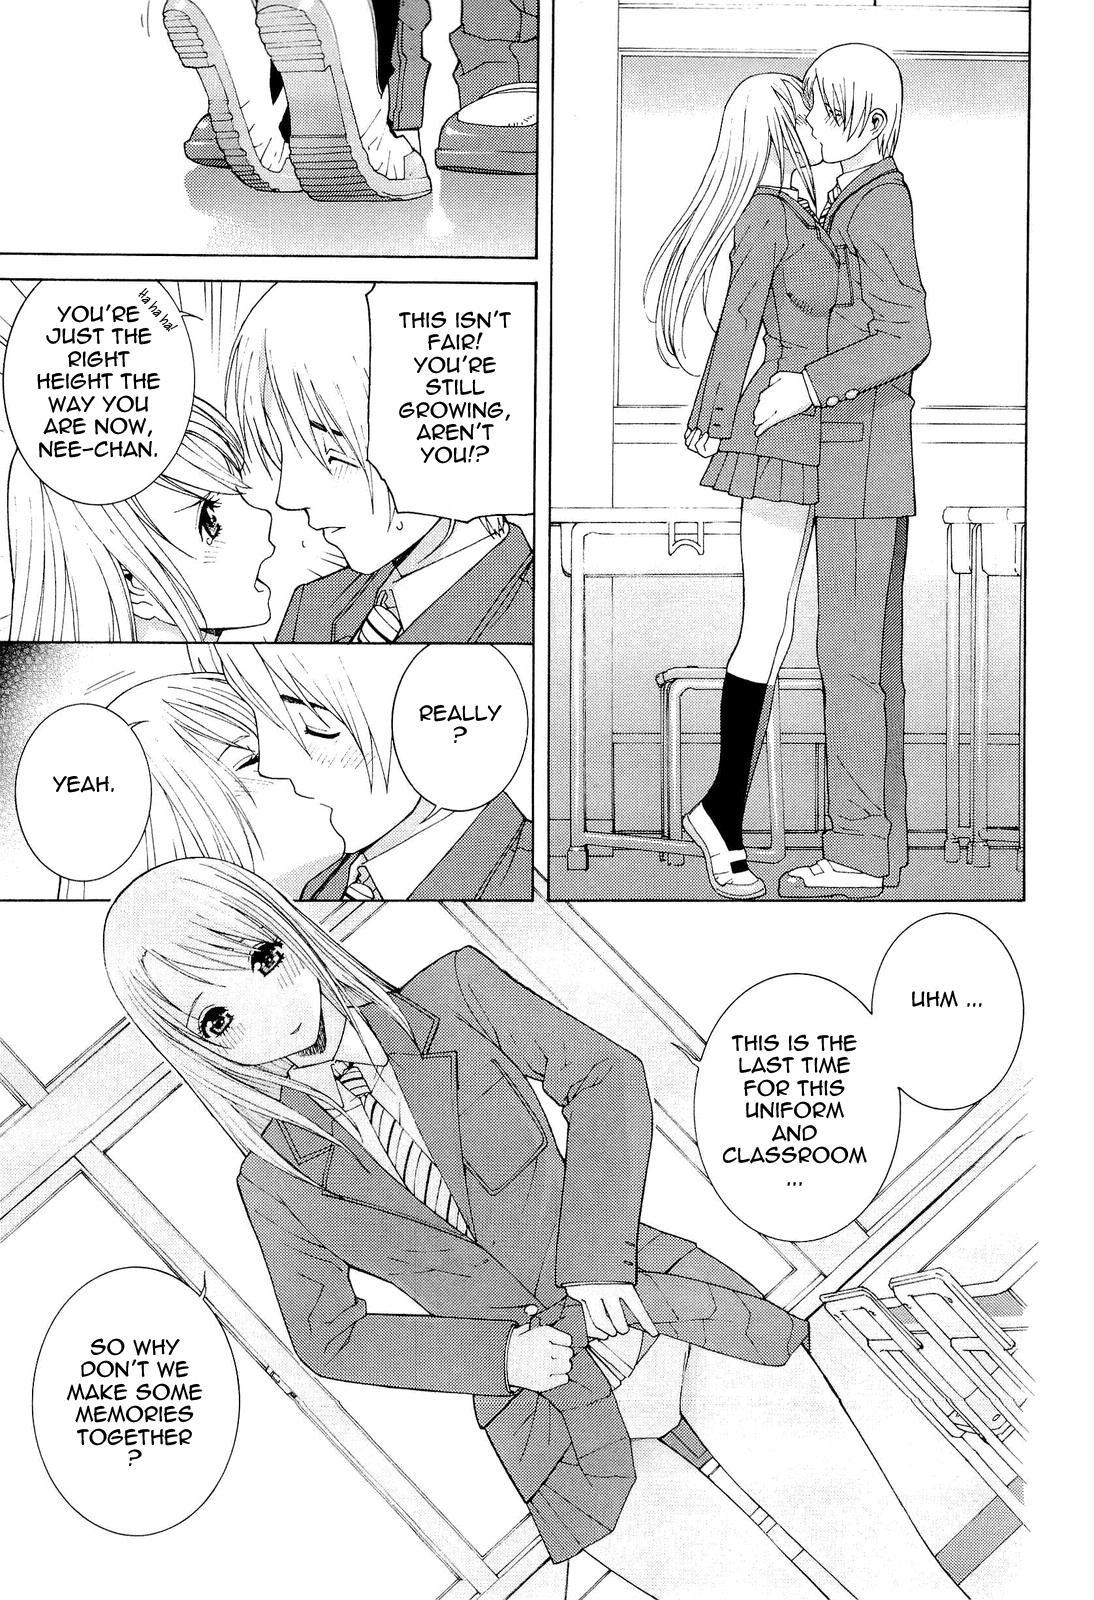 [Shinobu Tanei] Ane ♡ Imouto Love | Big-Sis Lil-Sis Love [English] {Tadanohito} 93